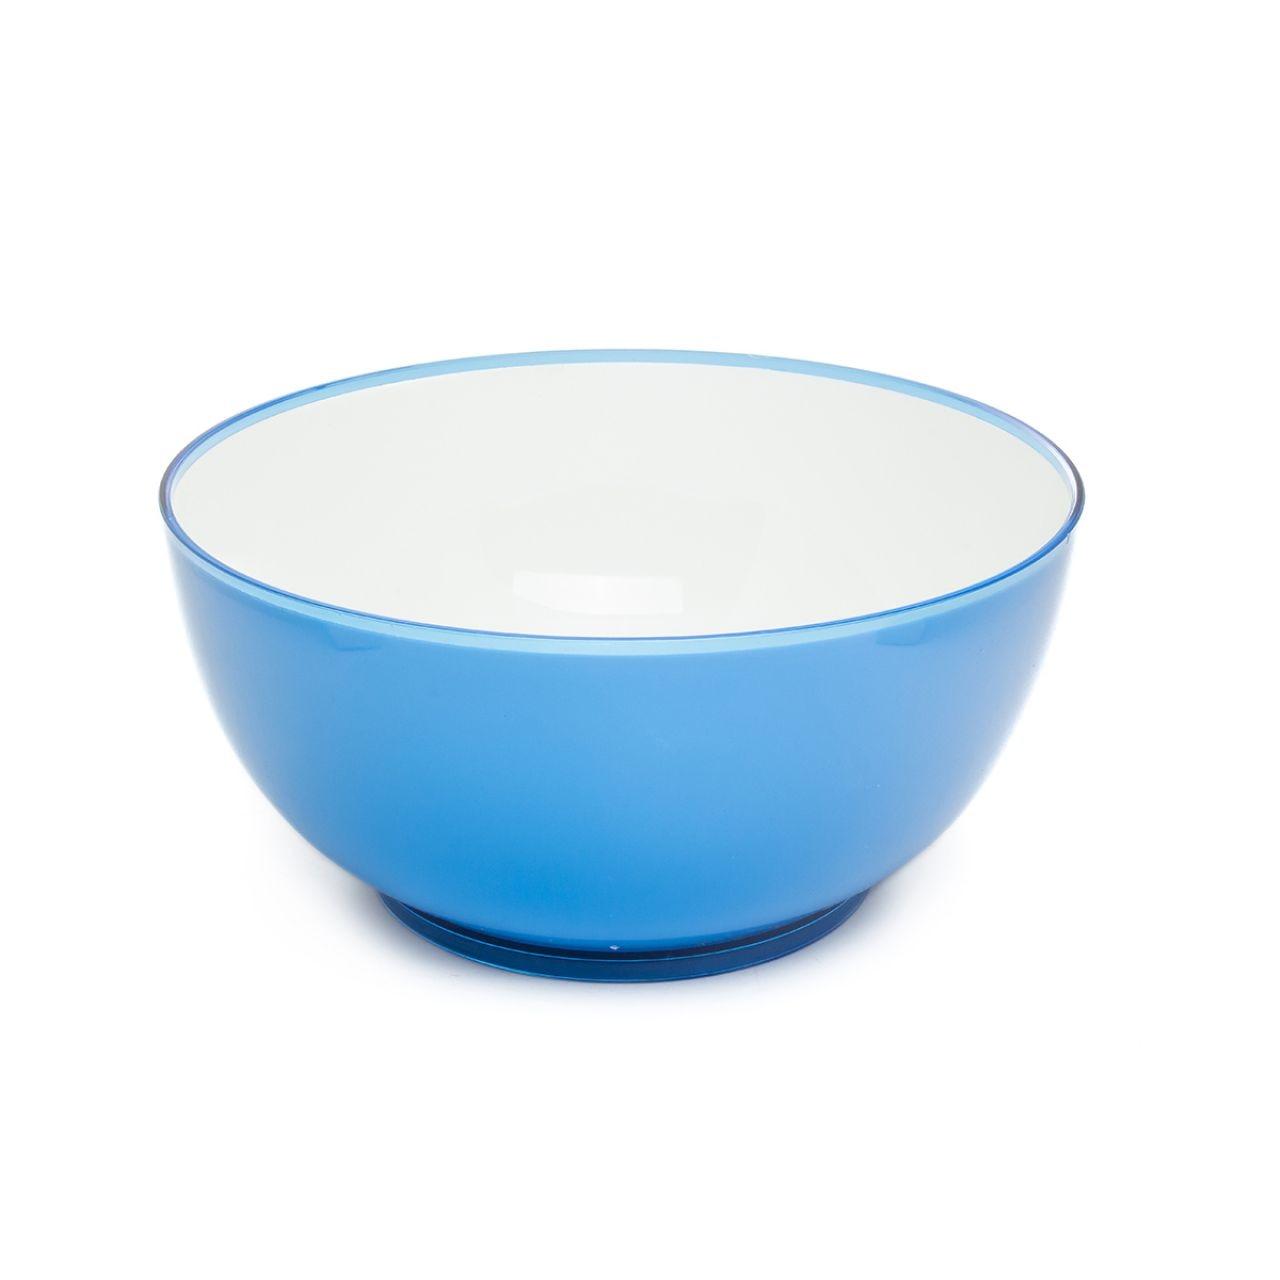 Tigela de Salada Azul-branco Redonda 2 Cor